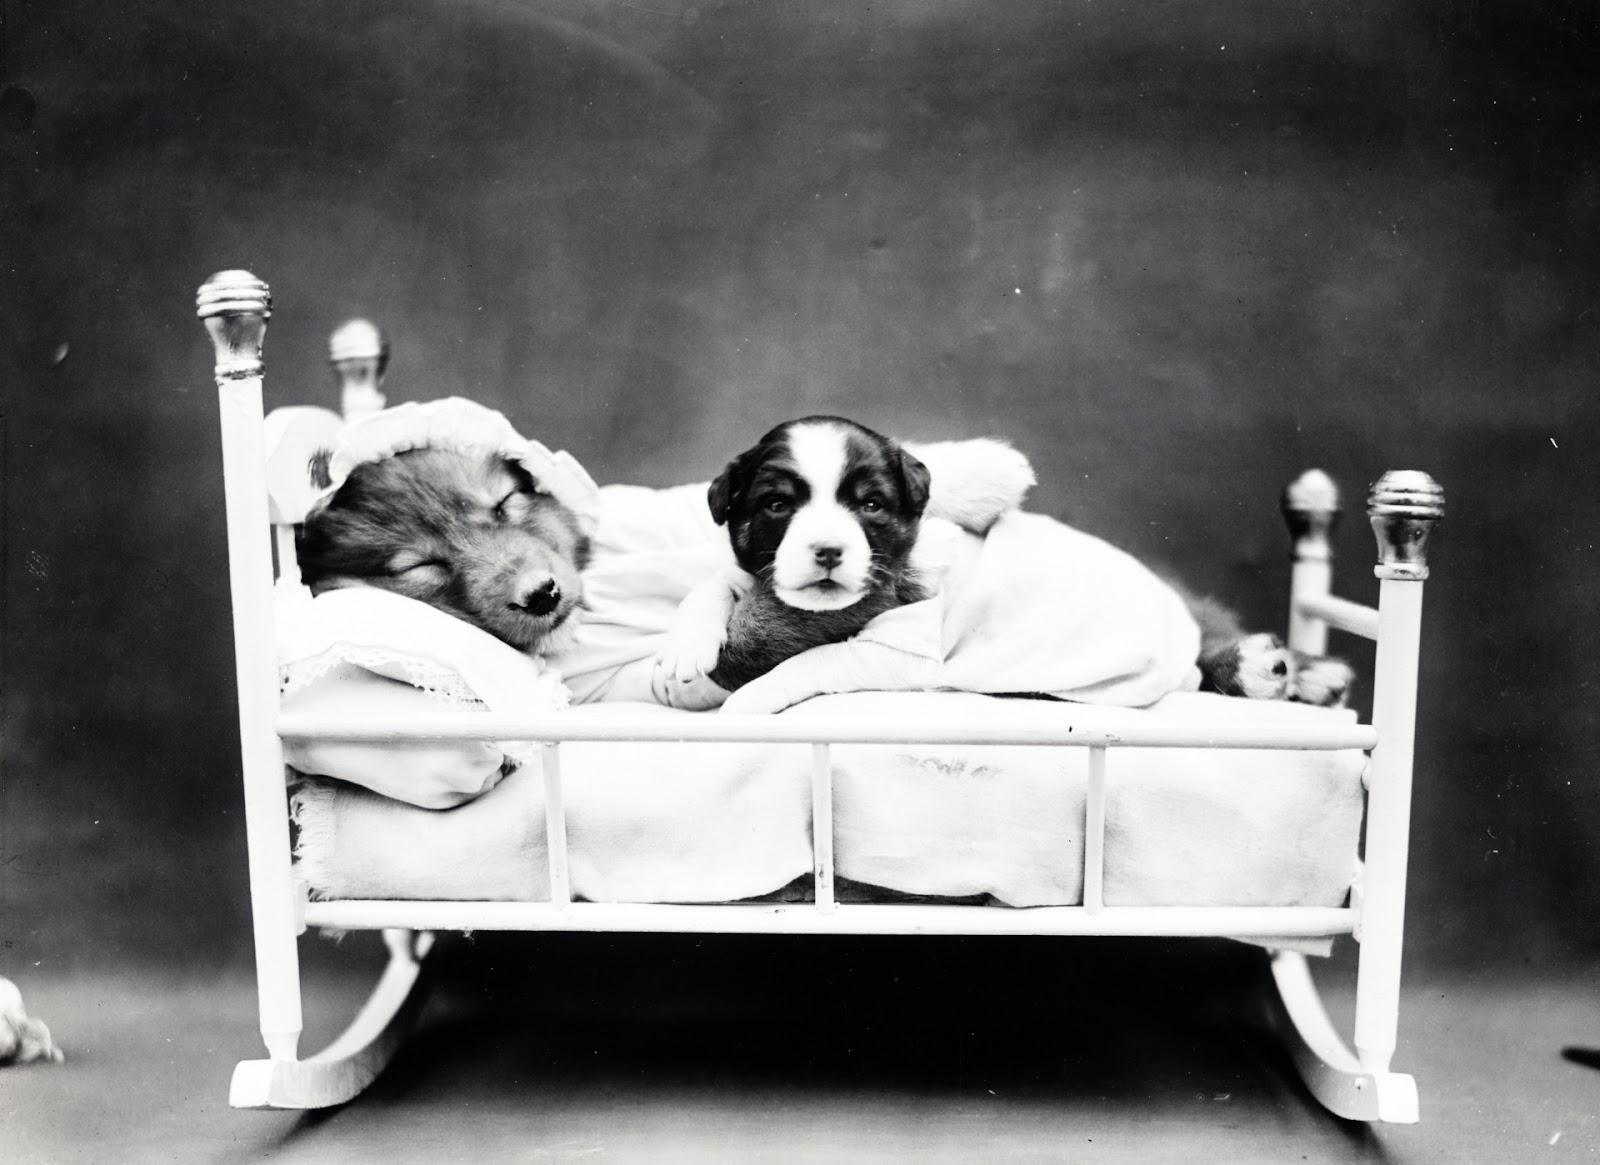 puppy-bedtime-vintage-photo.jpg